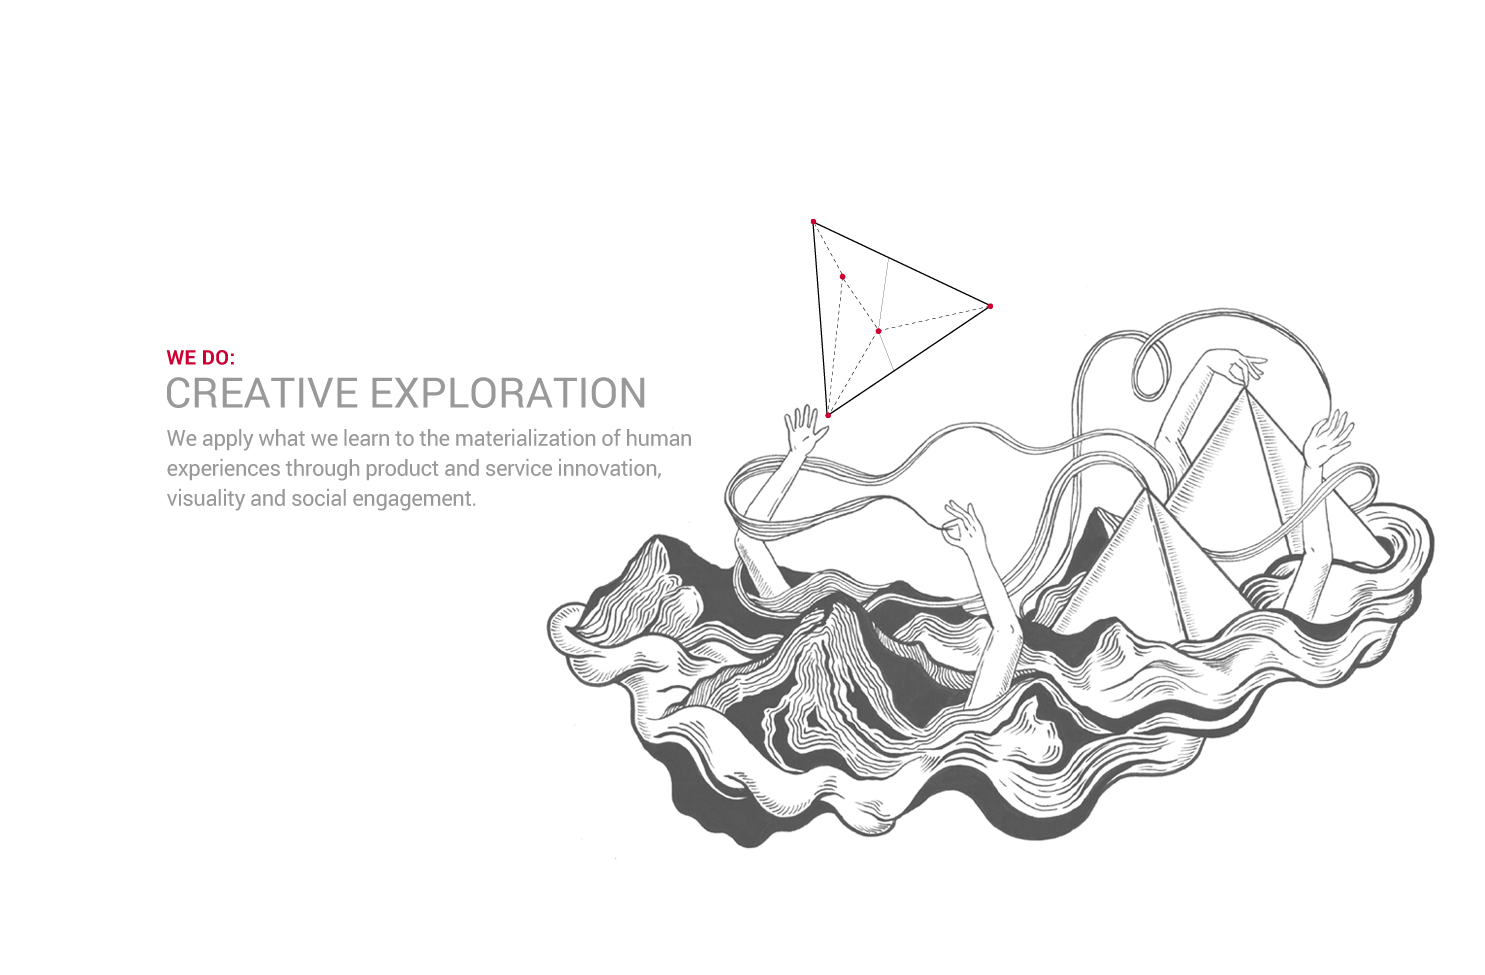 4_creative_exploration.jpg